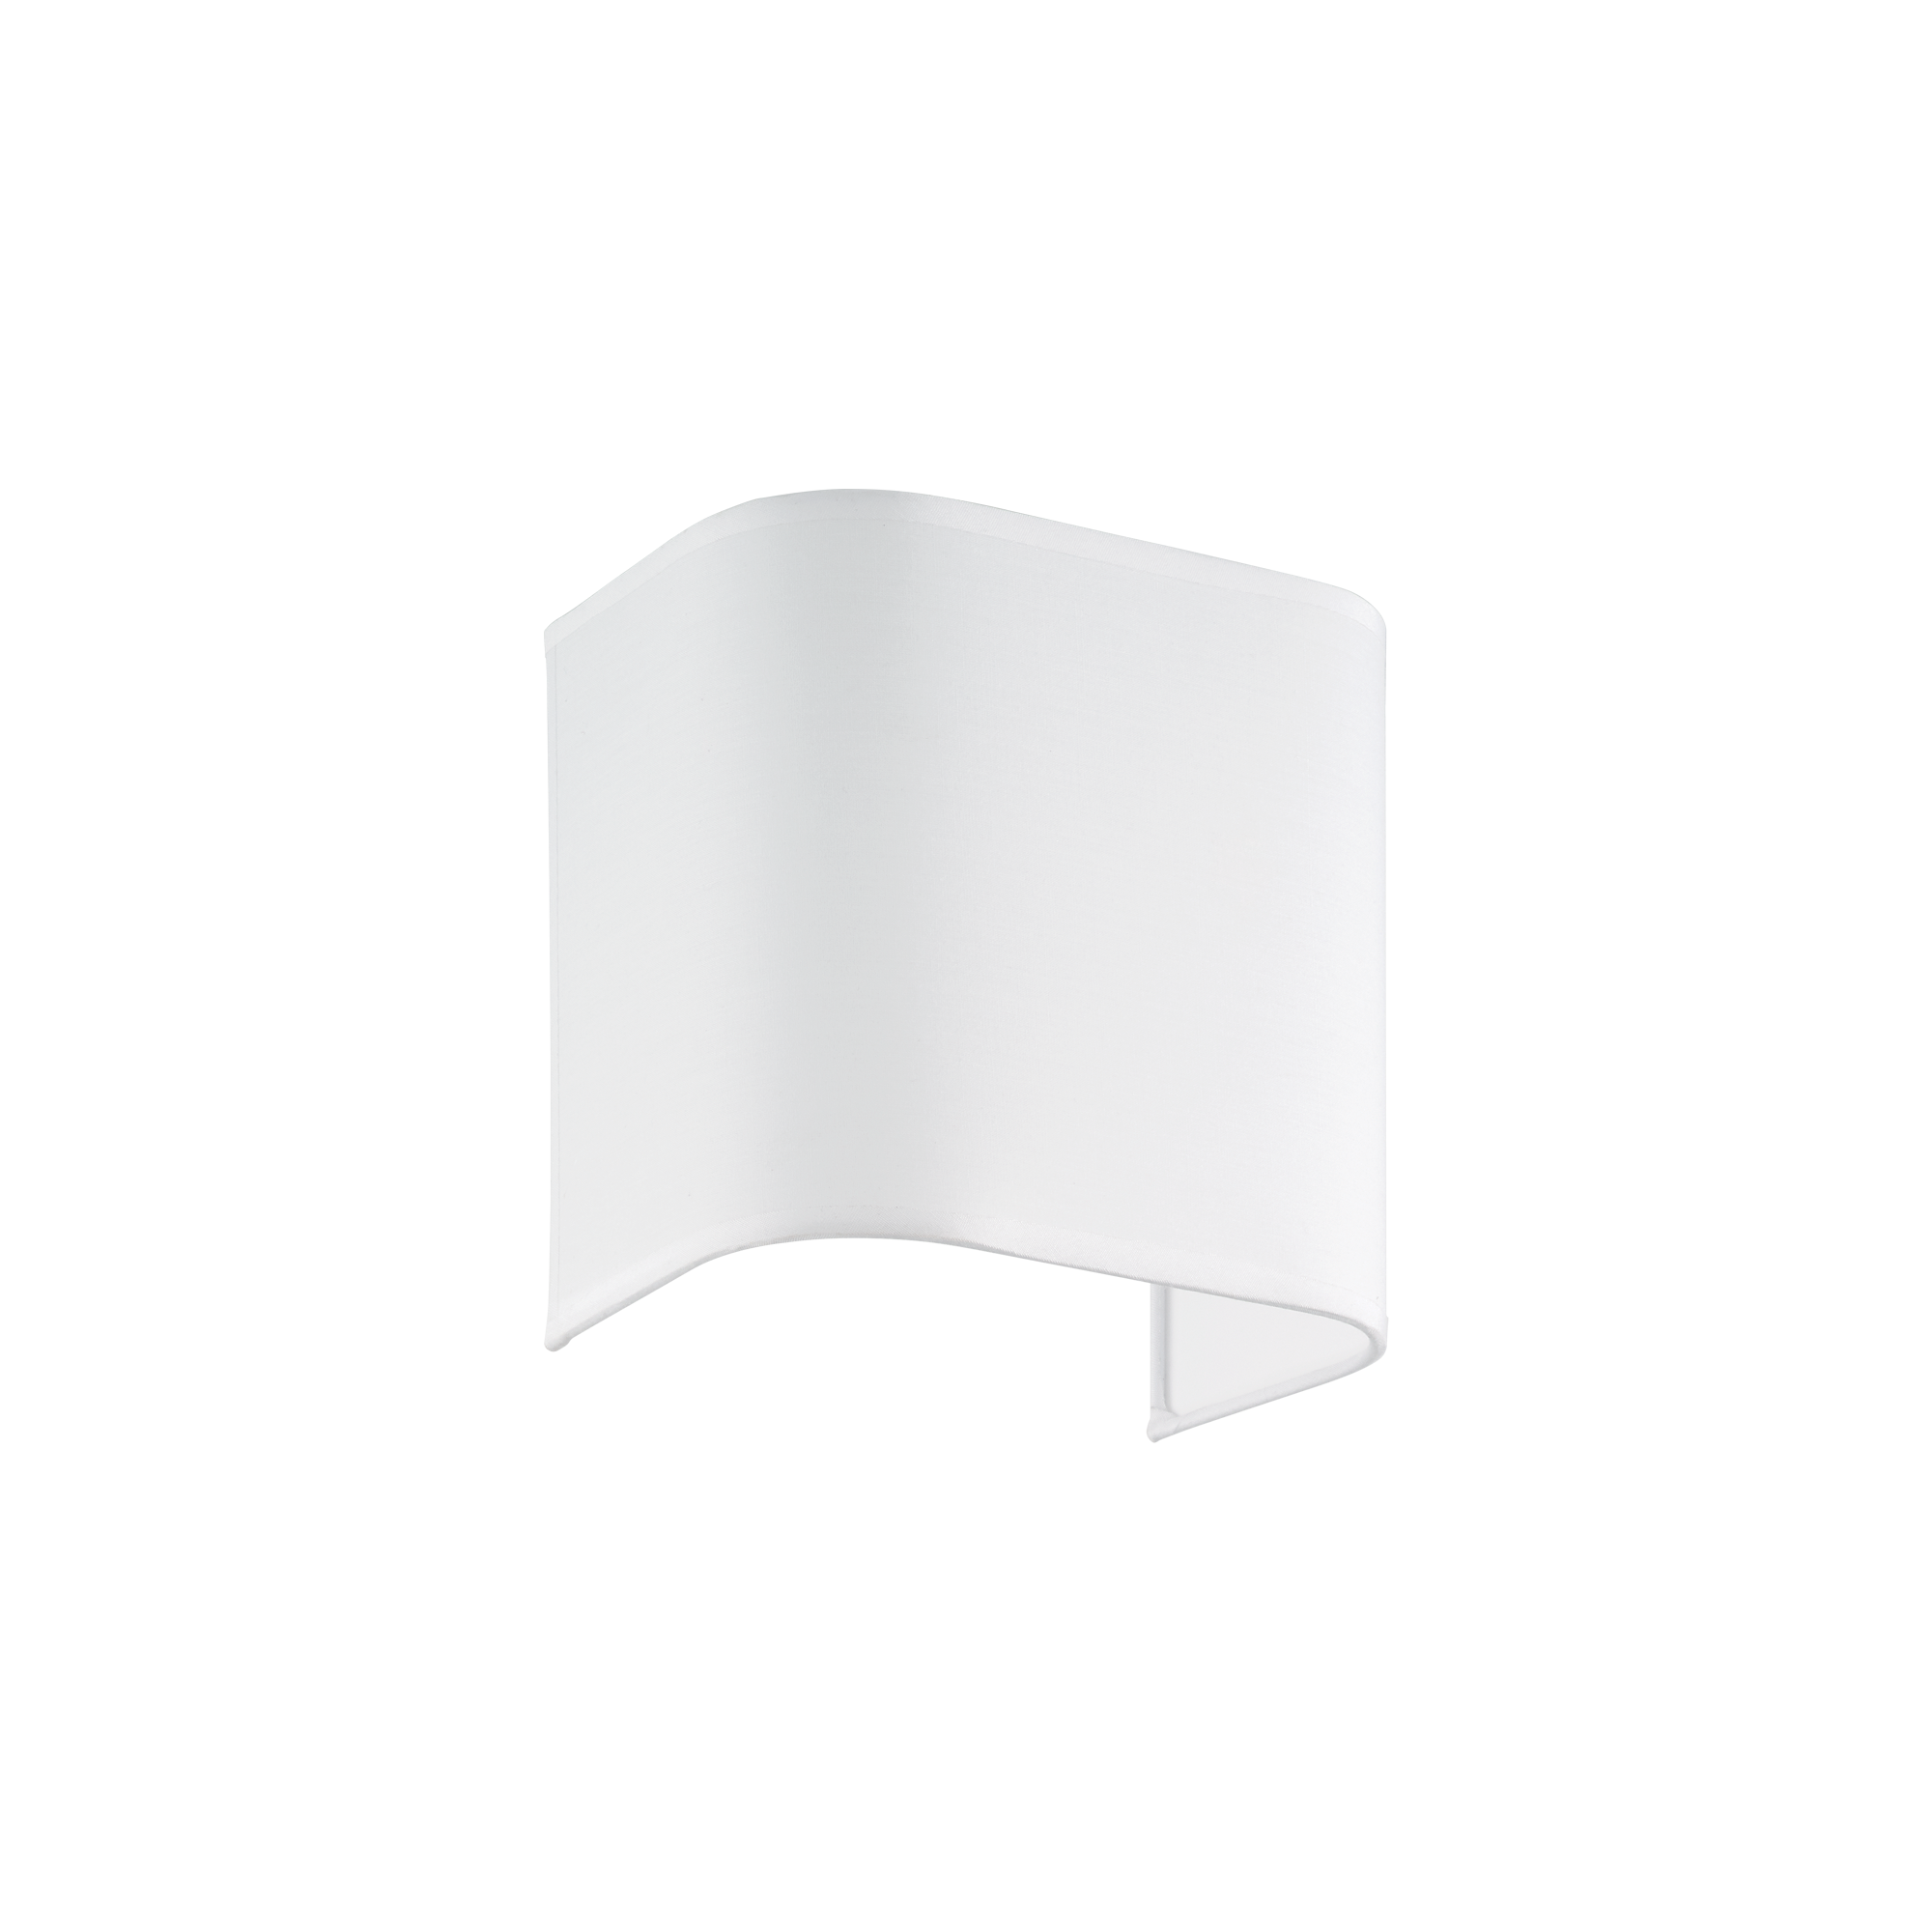 Абажур Ideal Lux Gea Paralume AP2 239576, белый, текстиль - фото 1